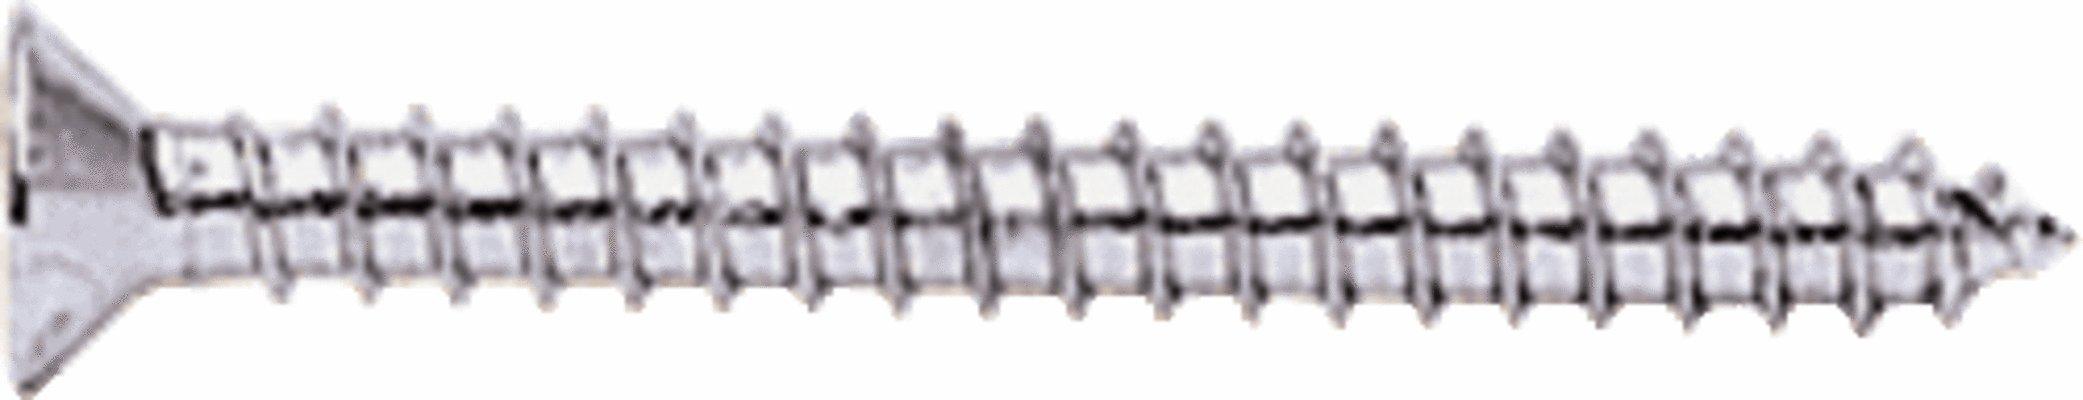 CRL Chrome Bulk 10 x 2'' Wall Mounting Flat Head Phillips Sheet Metal Screws